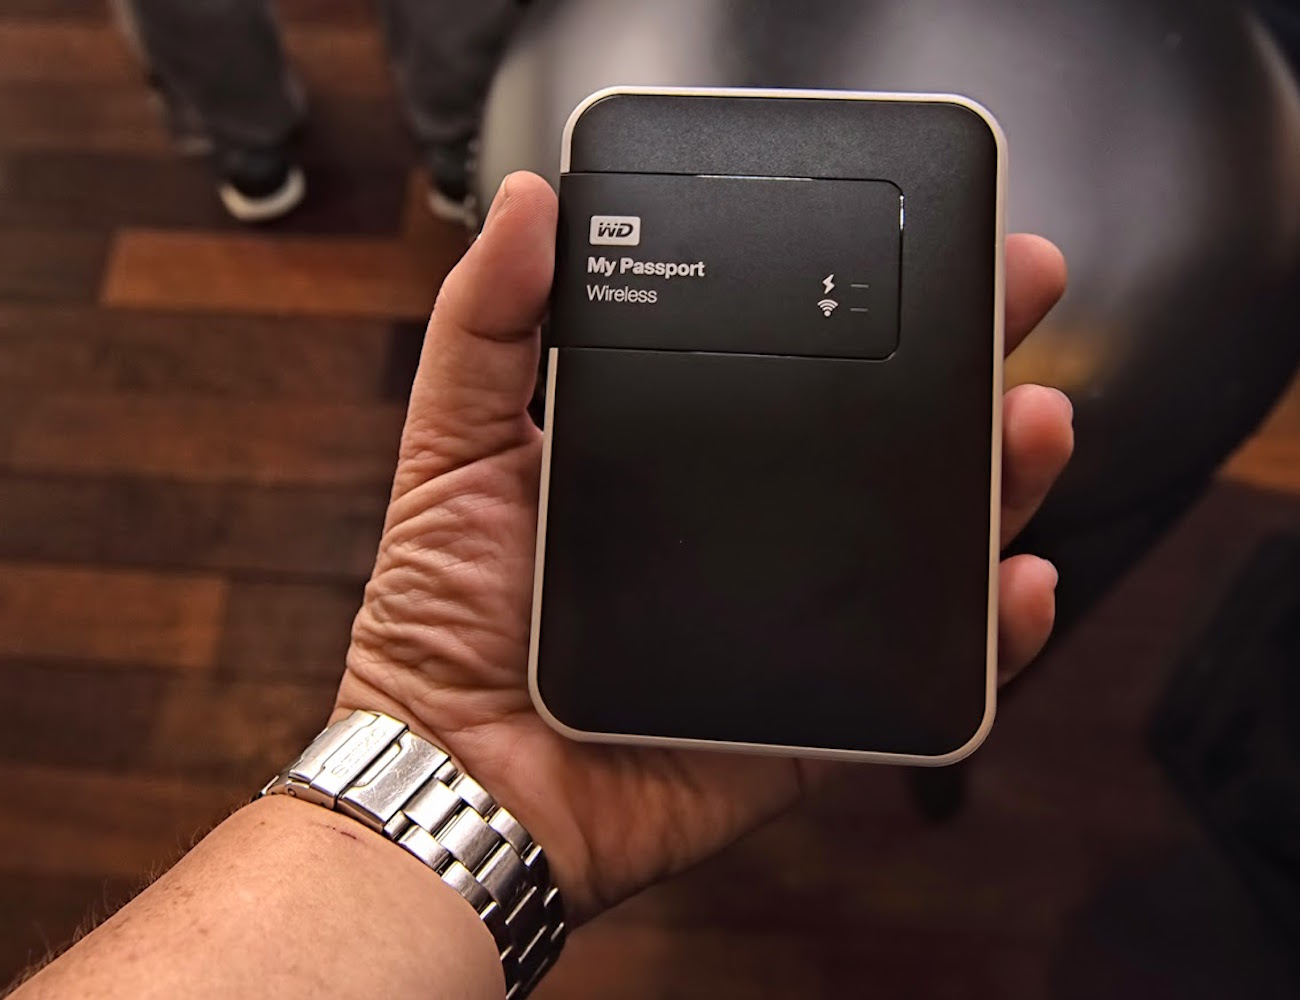 WD My Passport 2TB Wireless Hard Drive